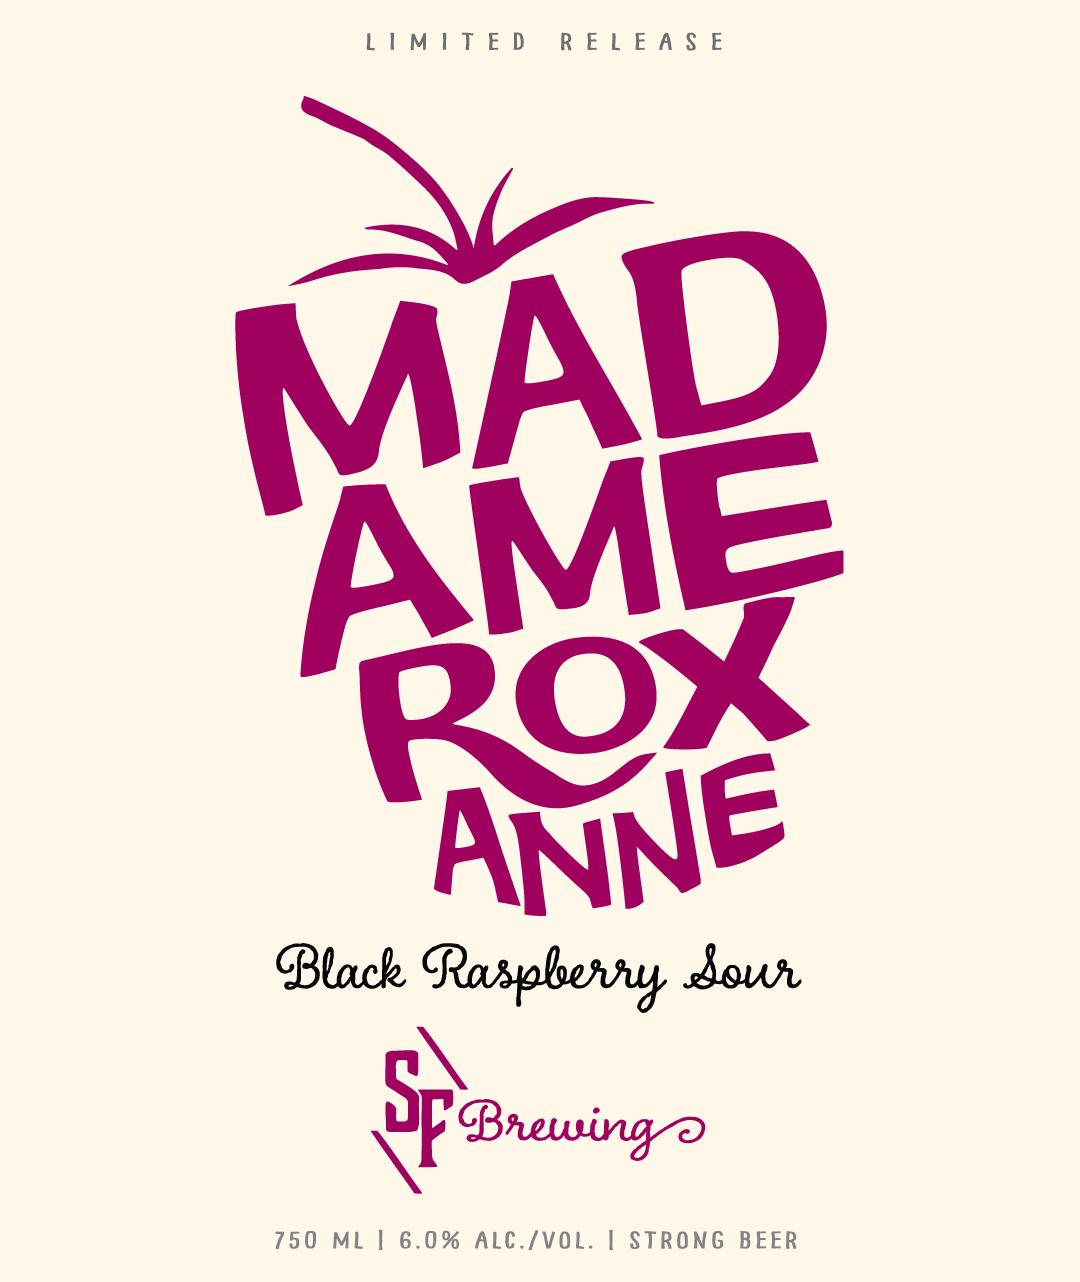 MADAME ROXANNE